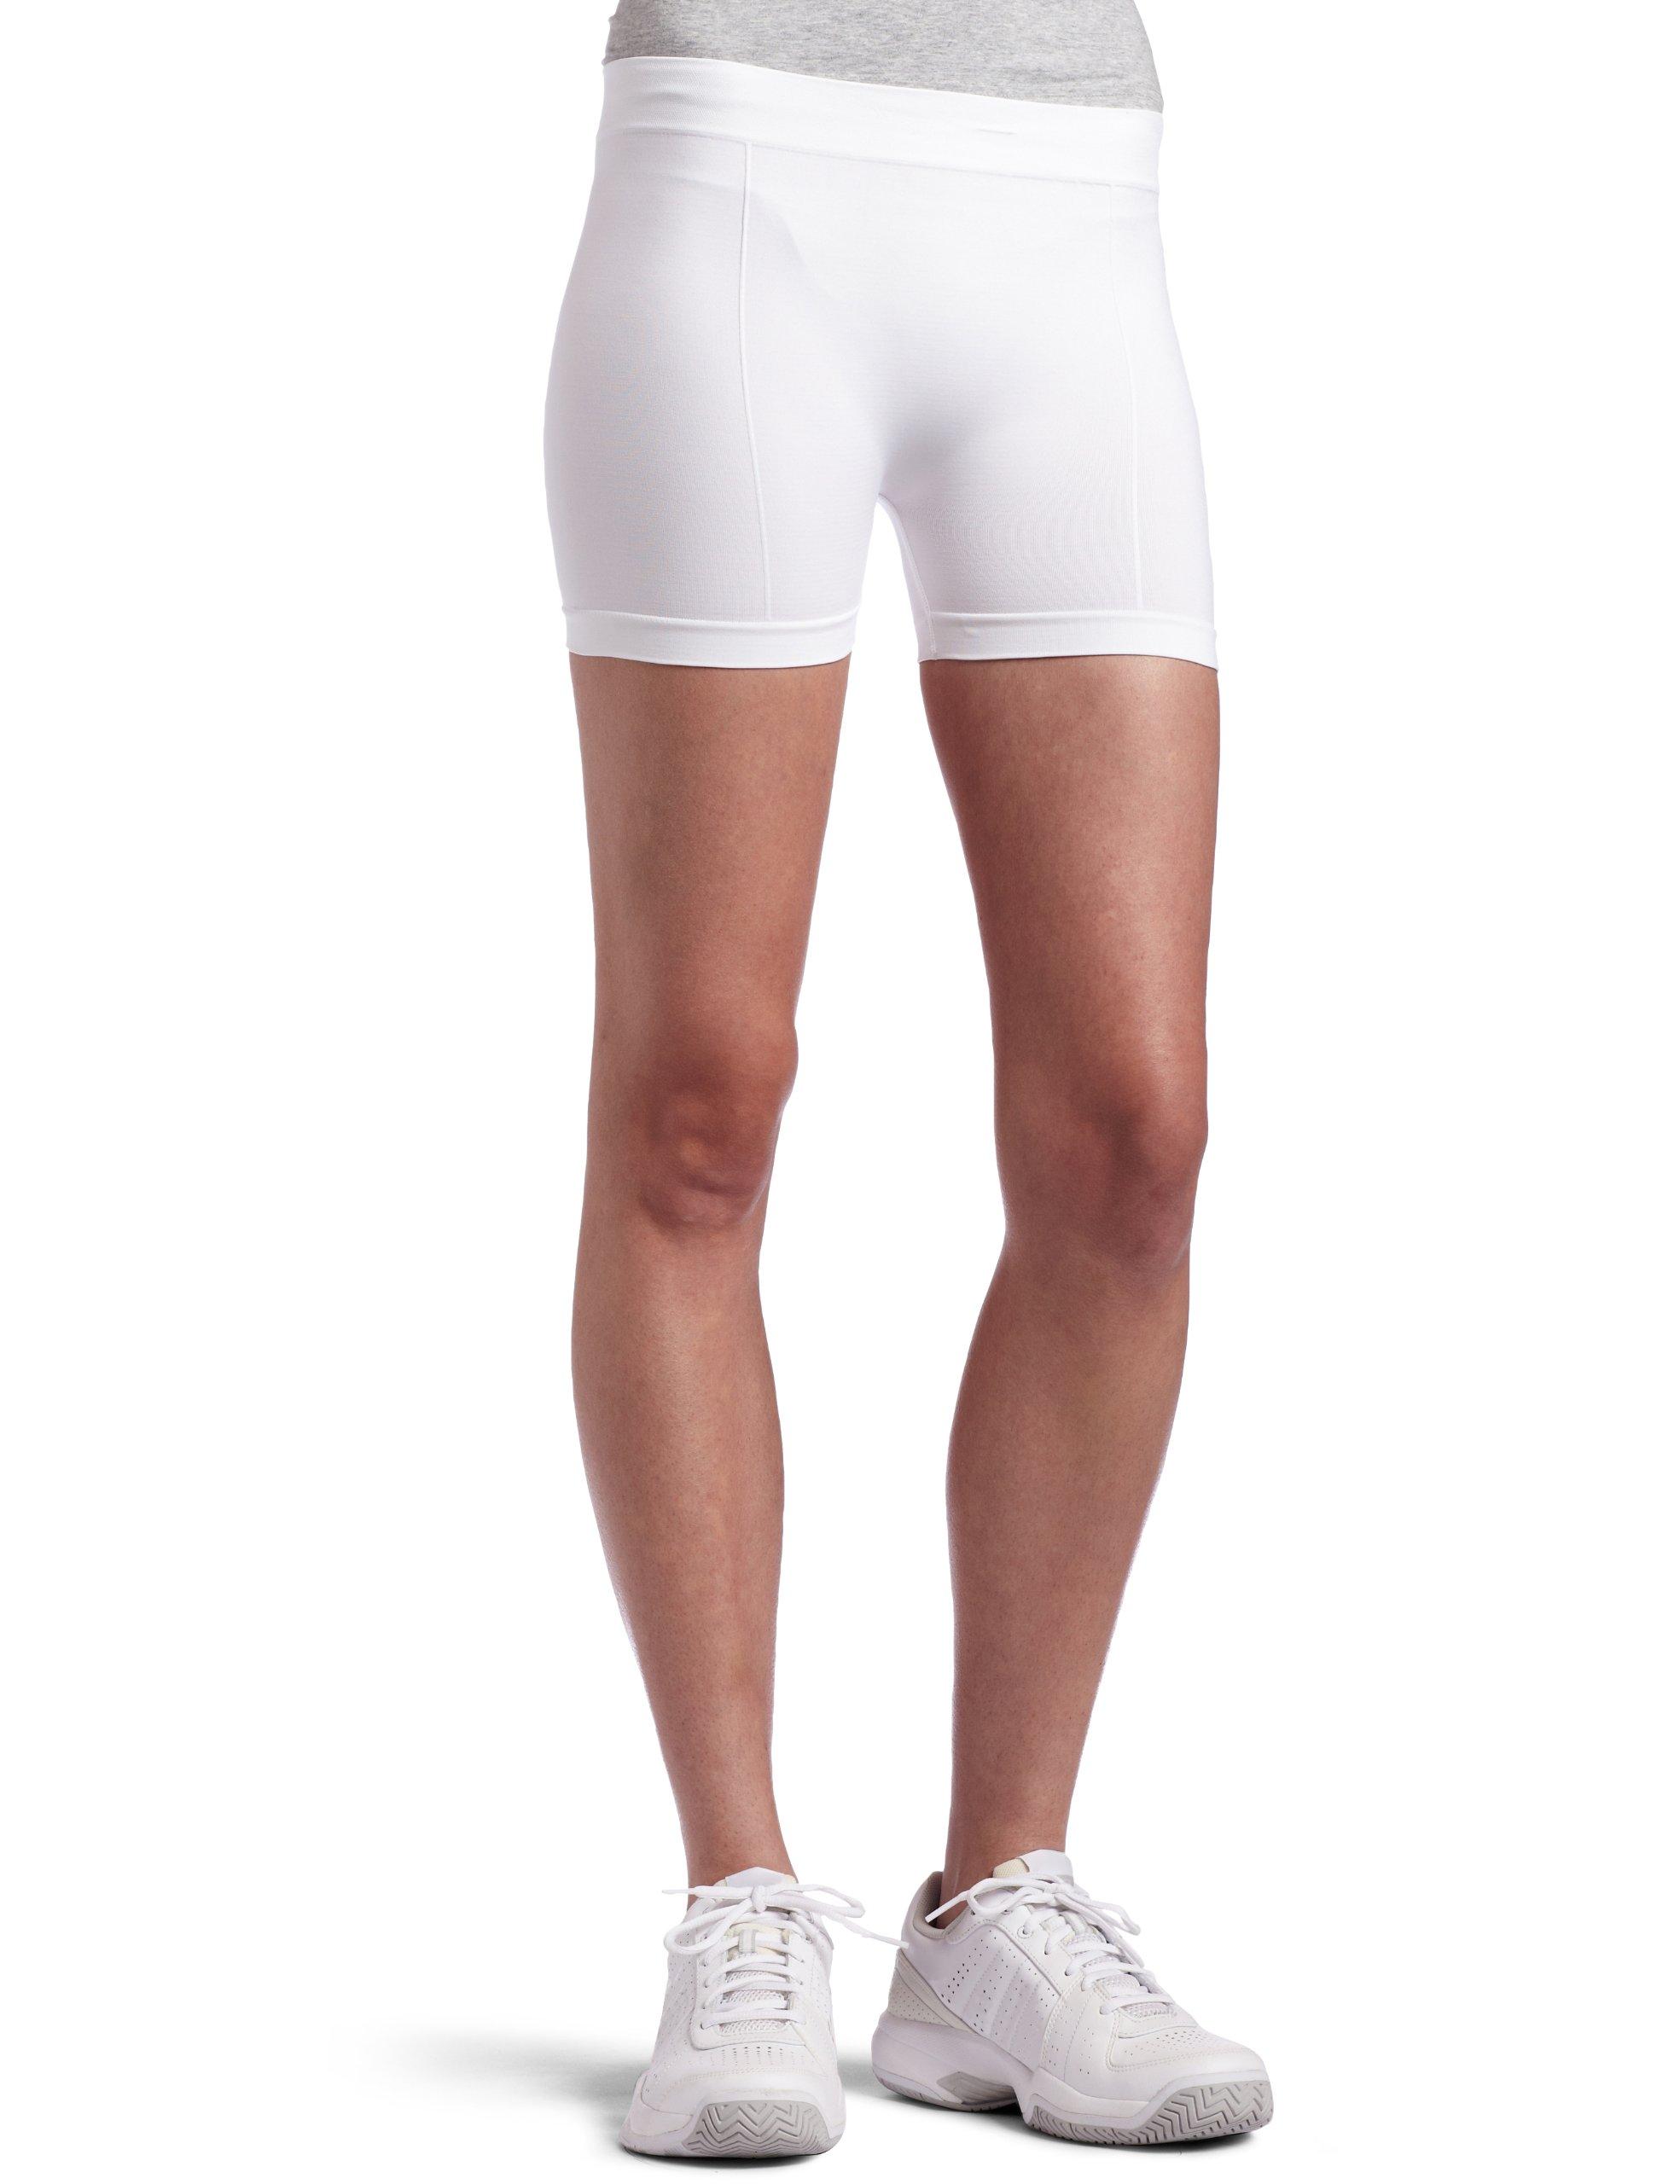 Bollé Women's Solid Panel Seamless Tennis Short, White, X-Small